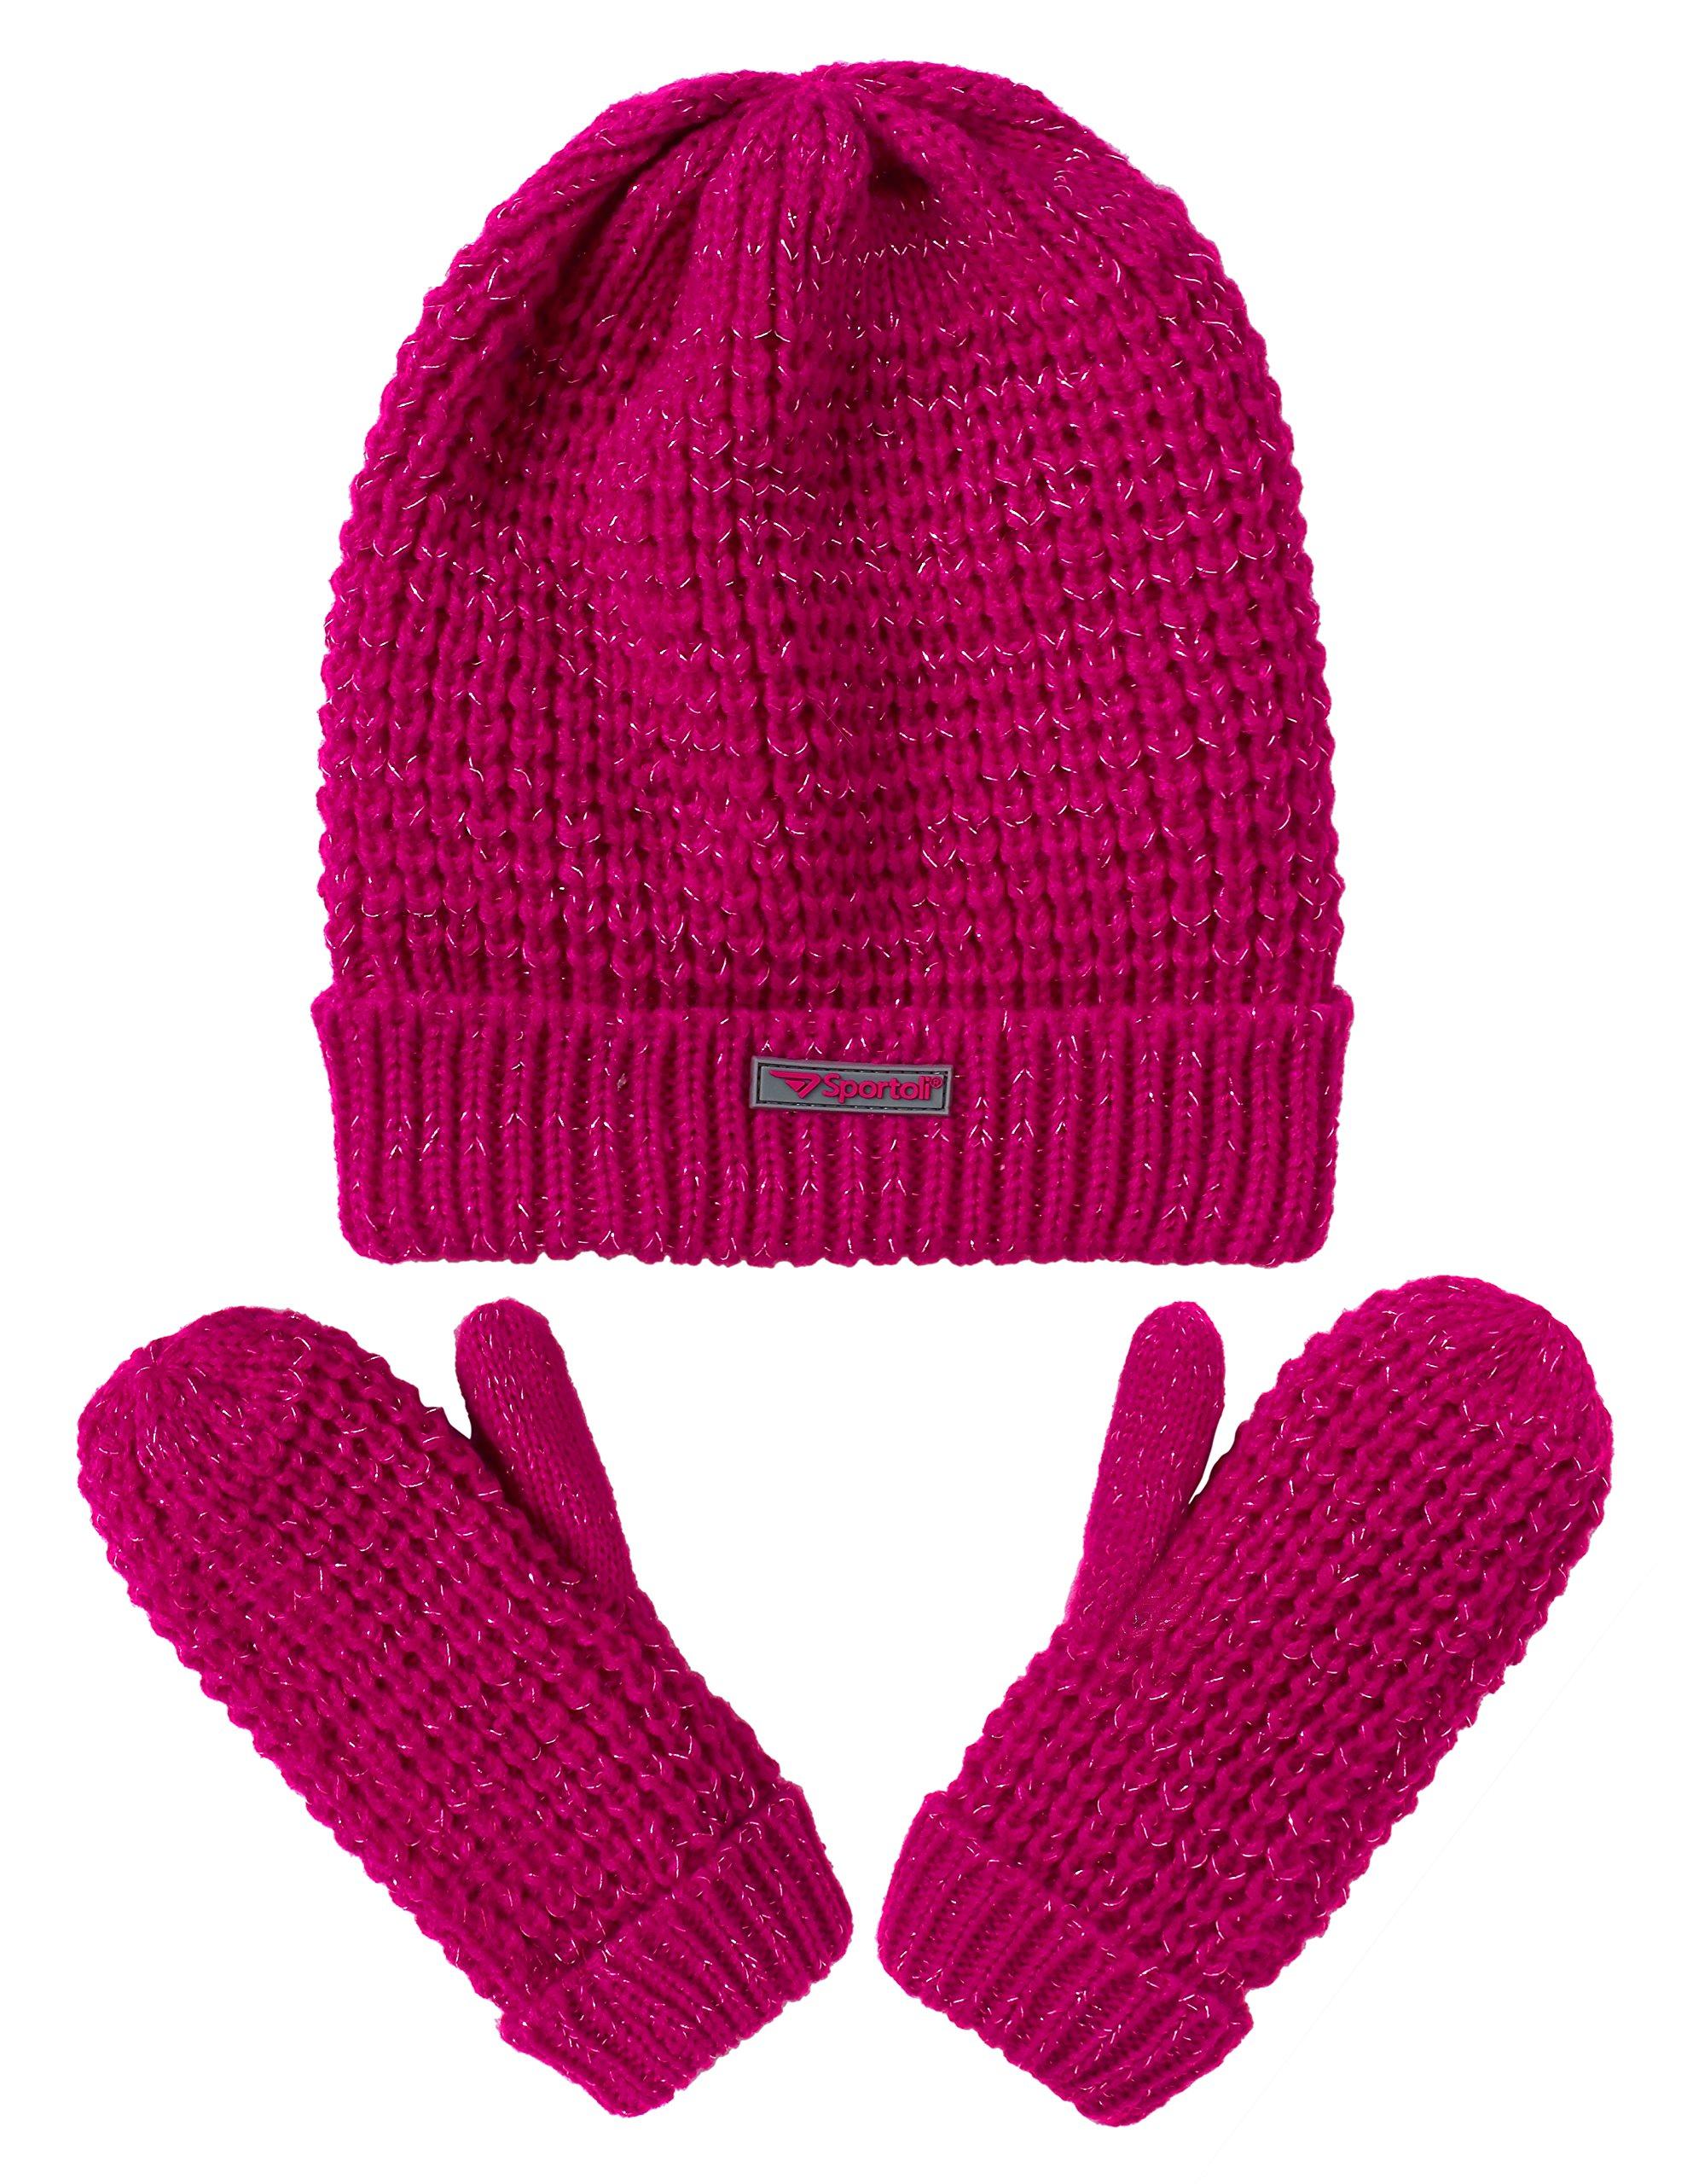 Sportoli Girls' Kids Knit Cold Weather Accessory Set Warm Hat, Scarf and Gloves (Pink)